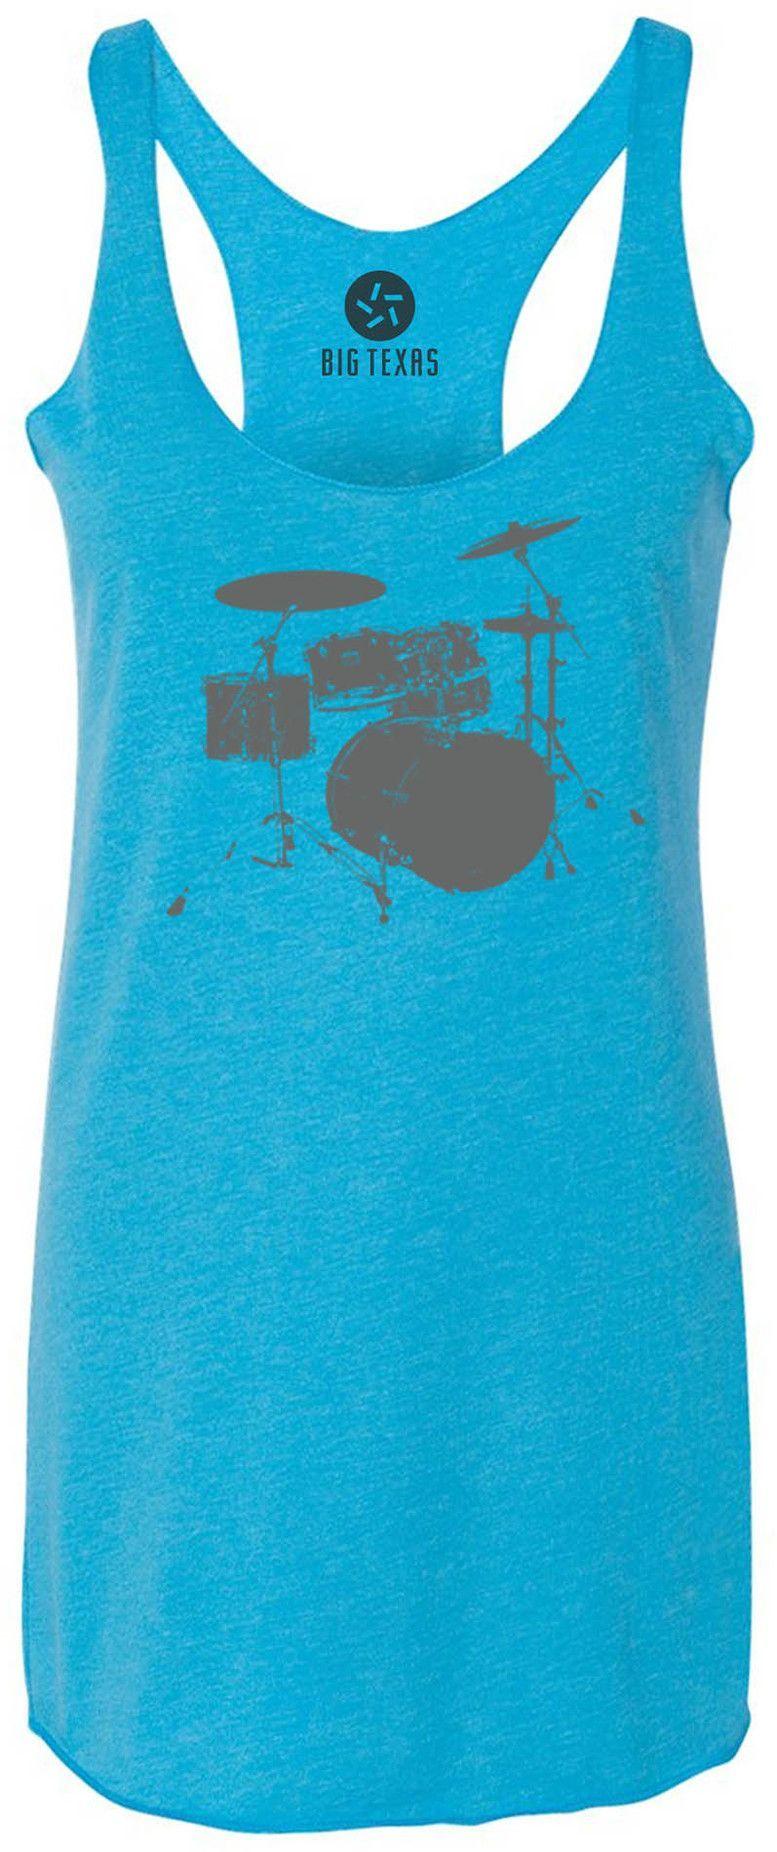 Drum Kit (Grey) Tri-Blend Racerback Tank-Top